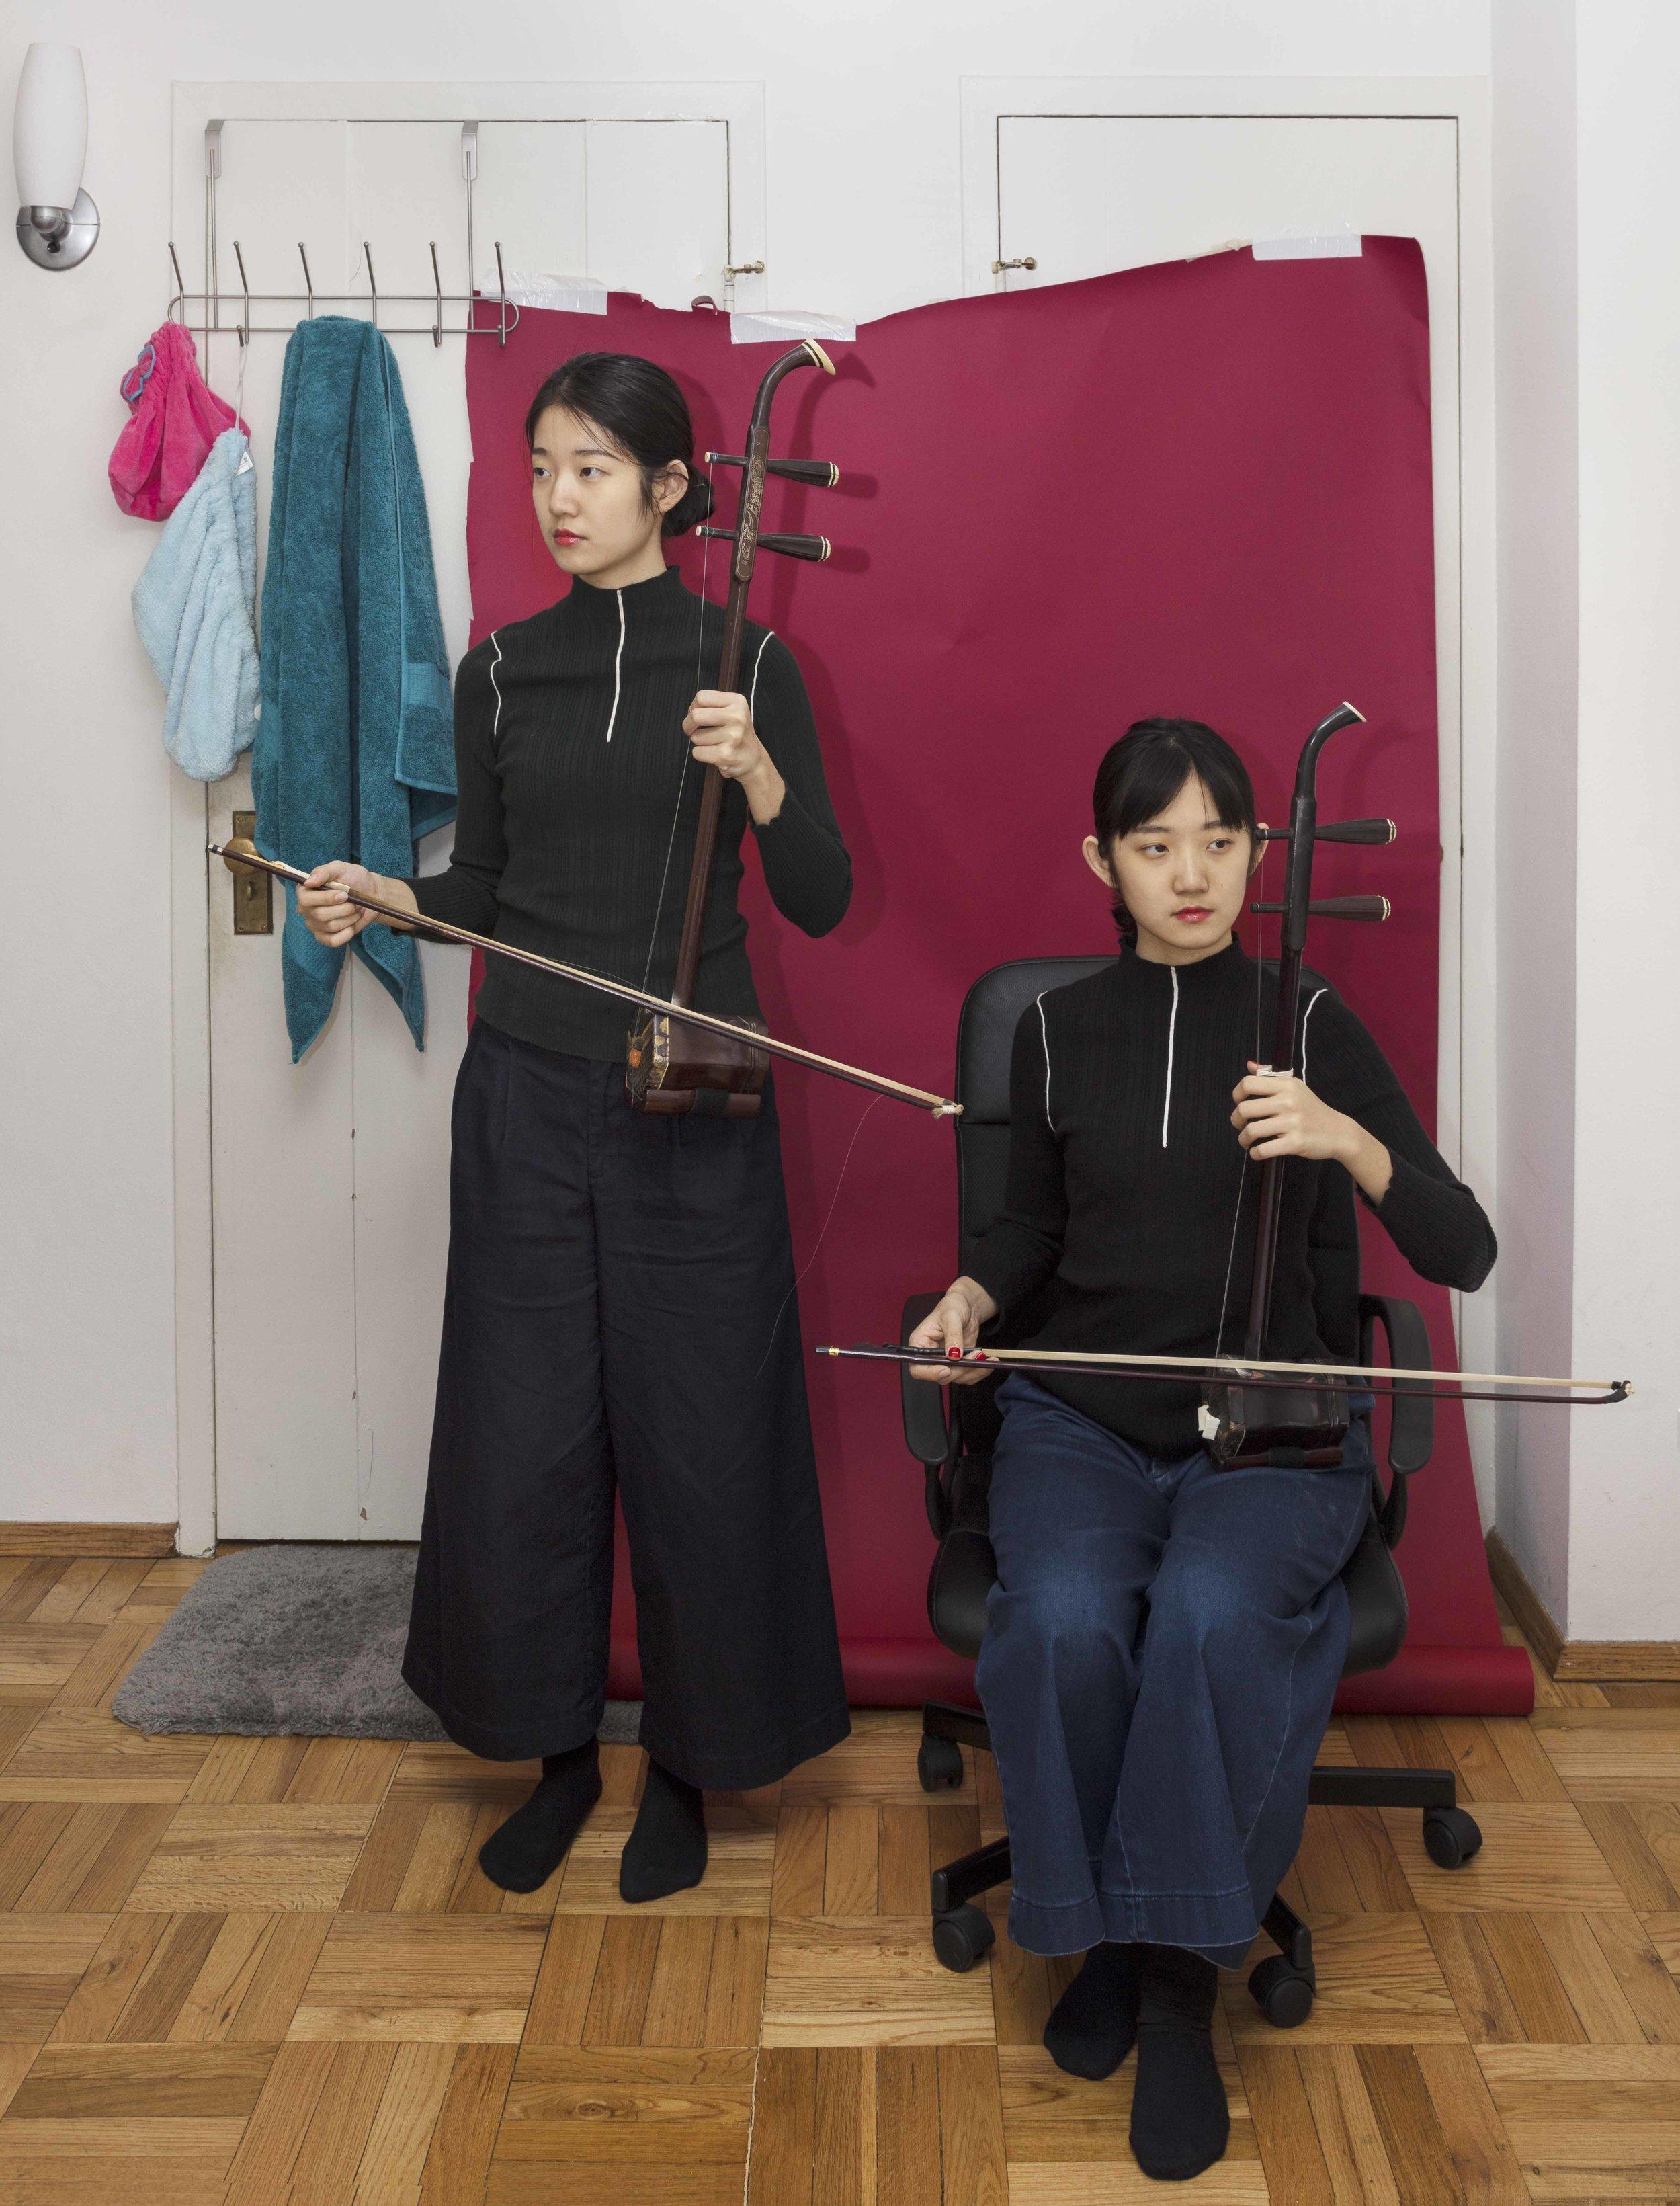 1 shuang xi- Rehearsal  .jpg